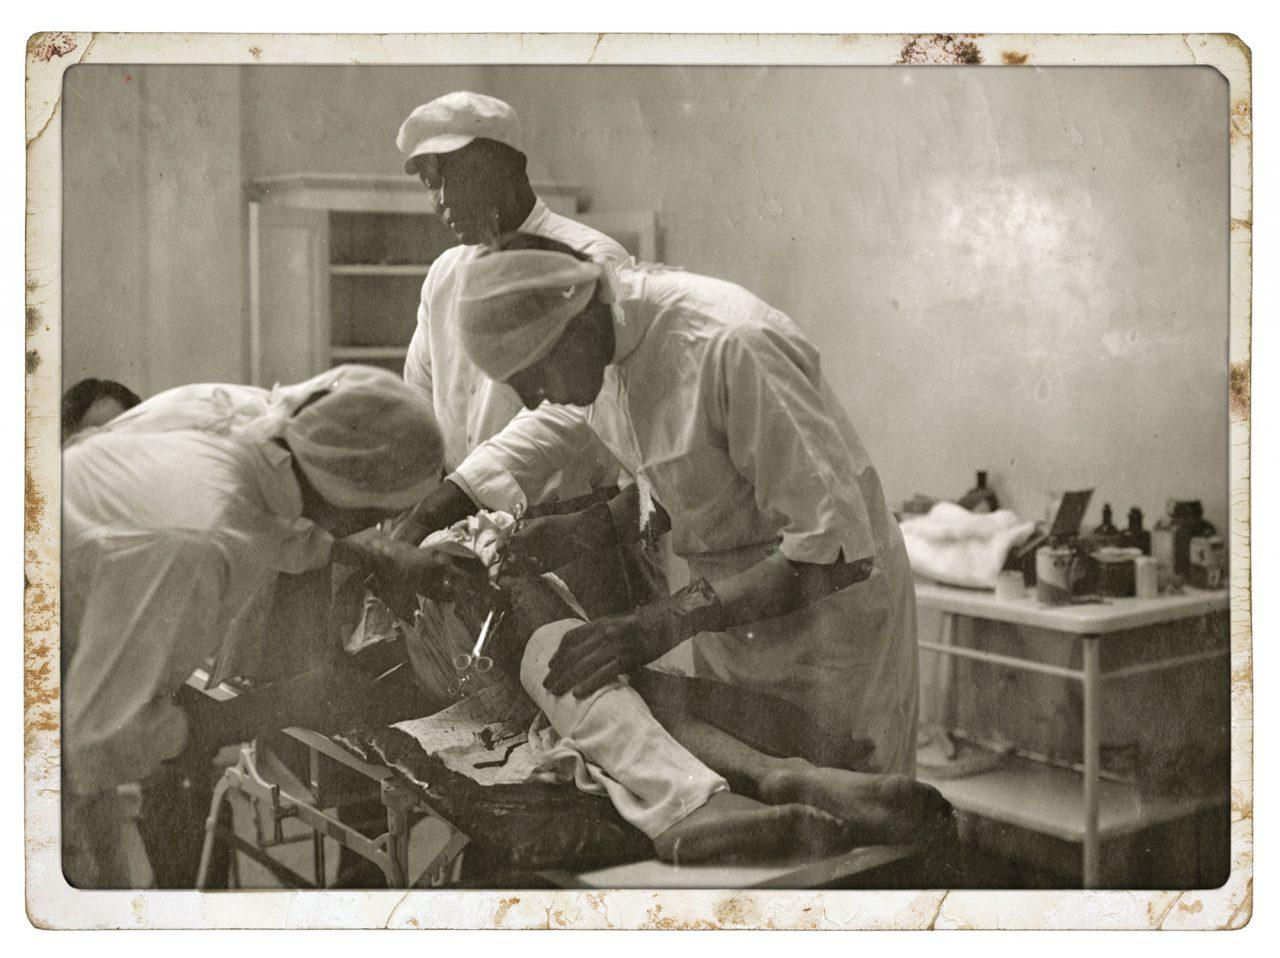 Surgeons perform knee surgery at the Arizona State Prison Hospital, circa 1920s; Photo courtesy Arizona Historical Society